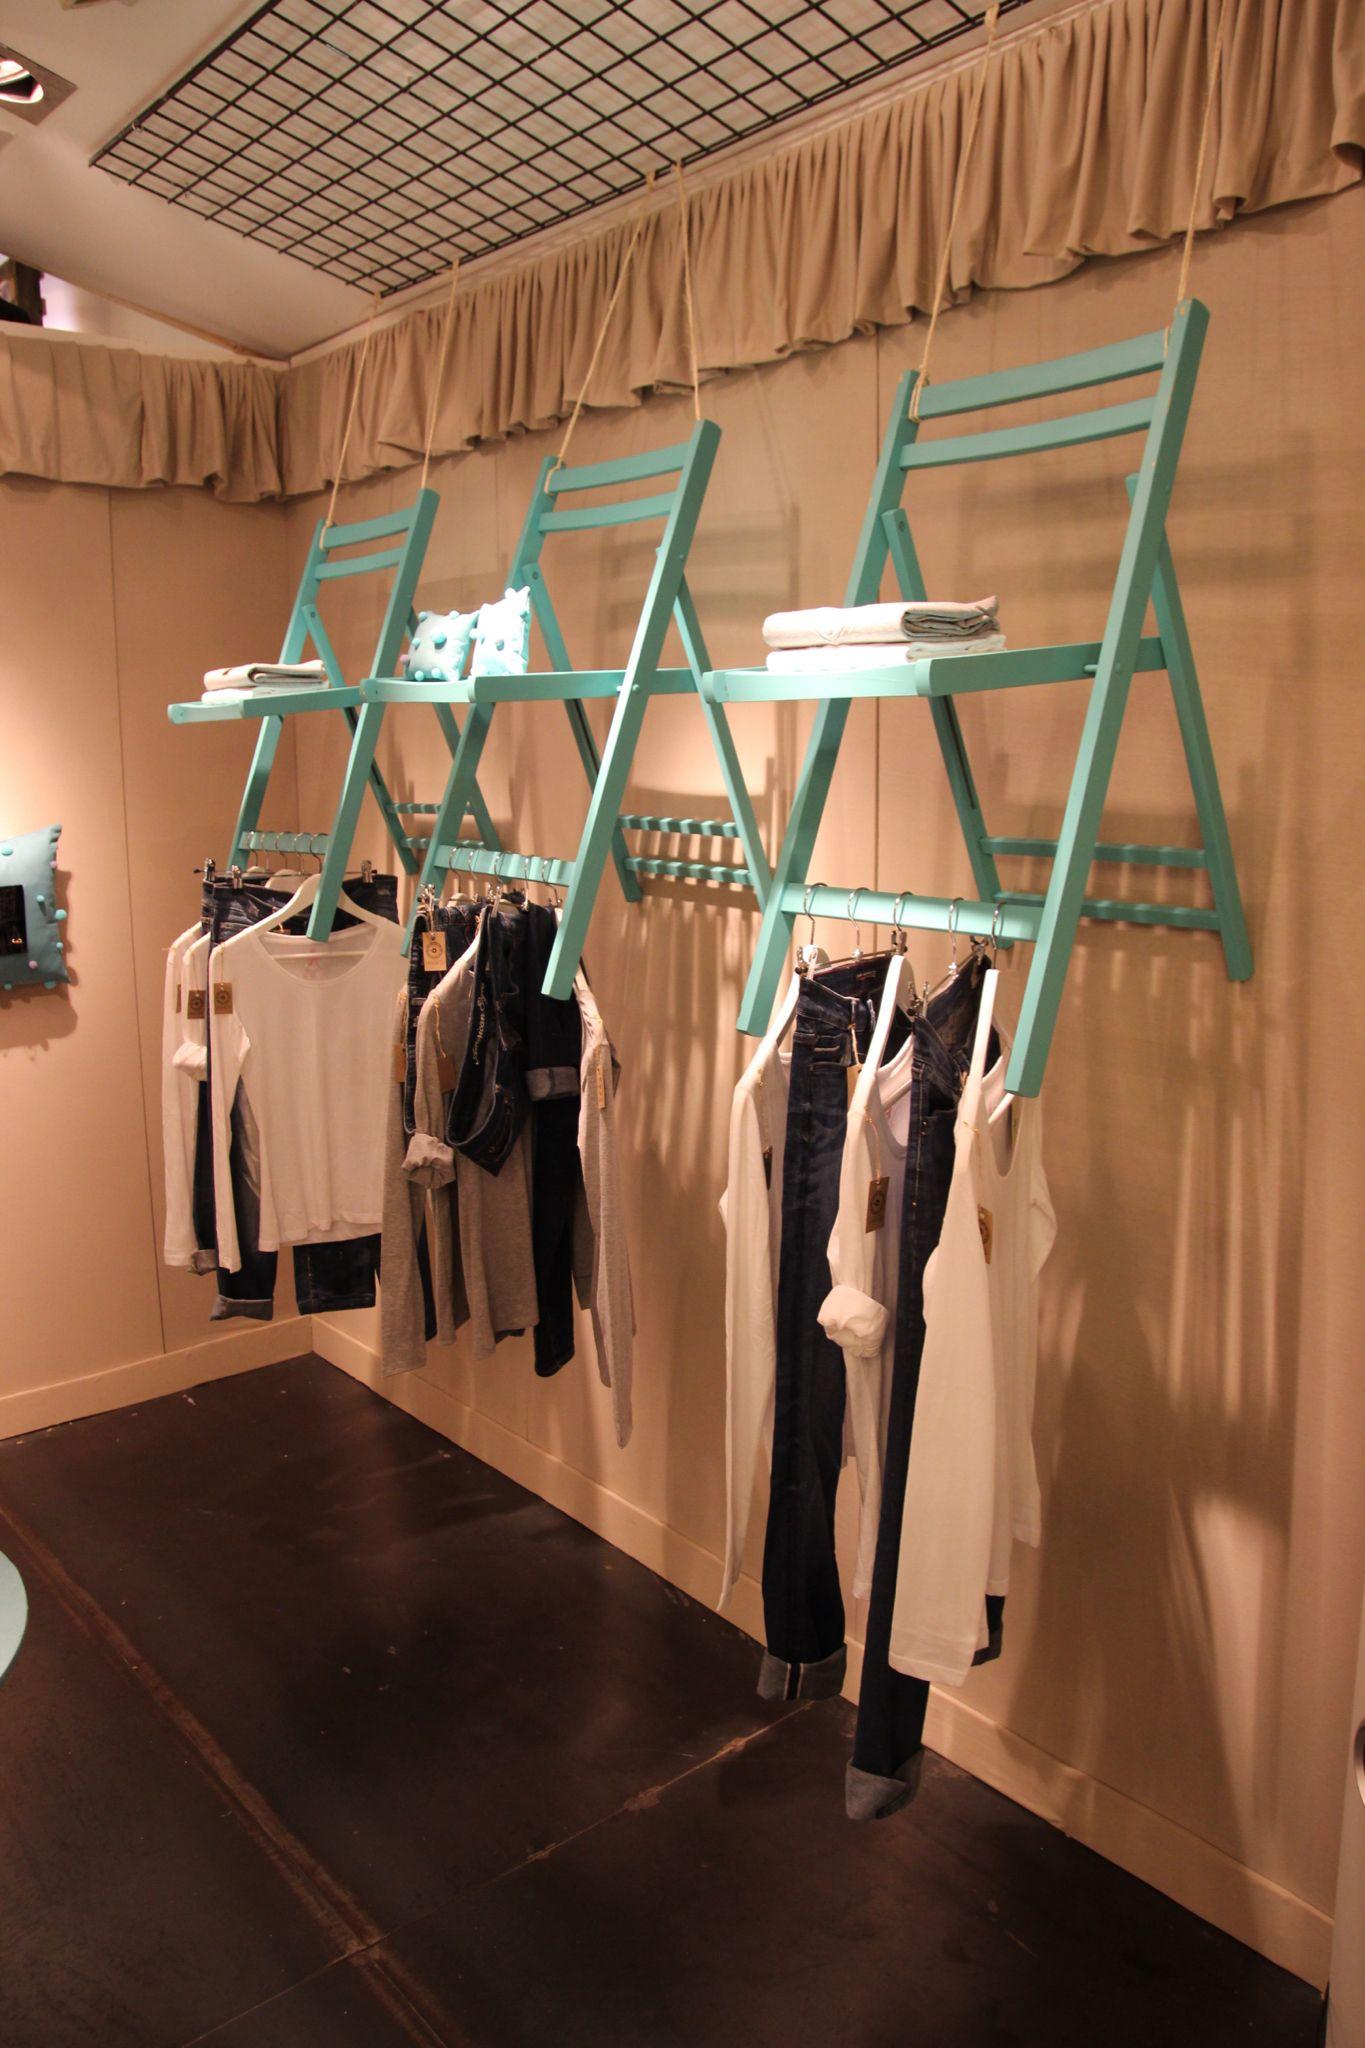 popupstore dise ador joias anais grupob pop up stores realizadas en rtidi pinterest. Black Bedroom Furniture Sets. Home Design Ideas